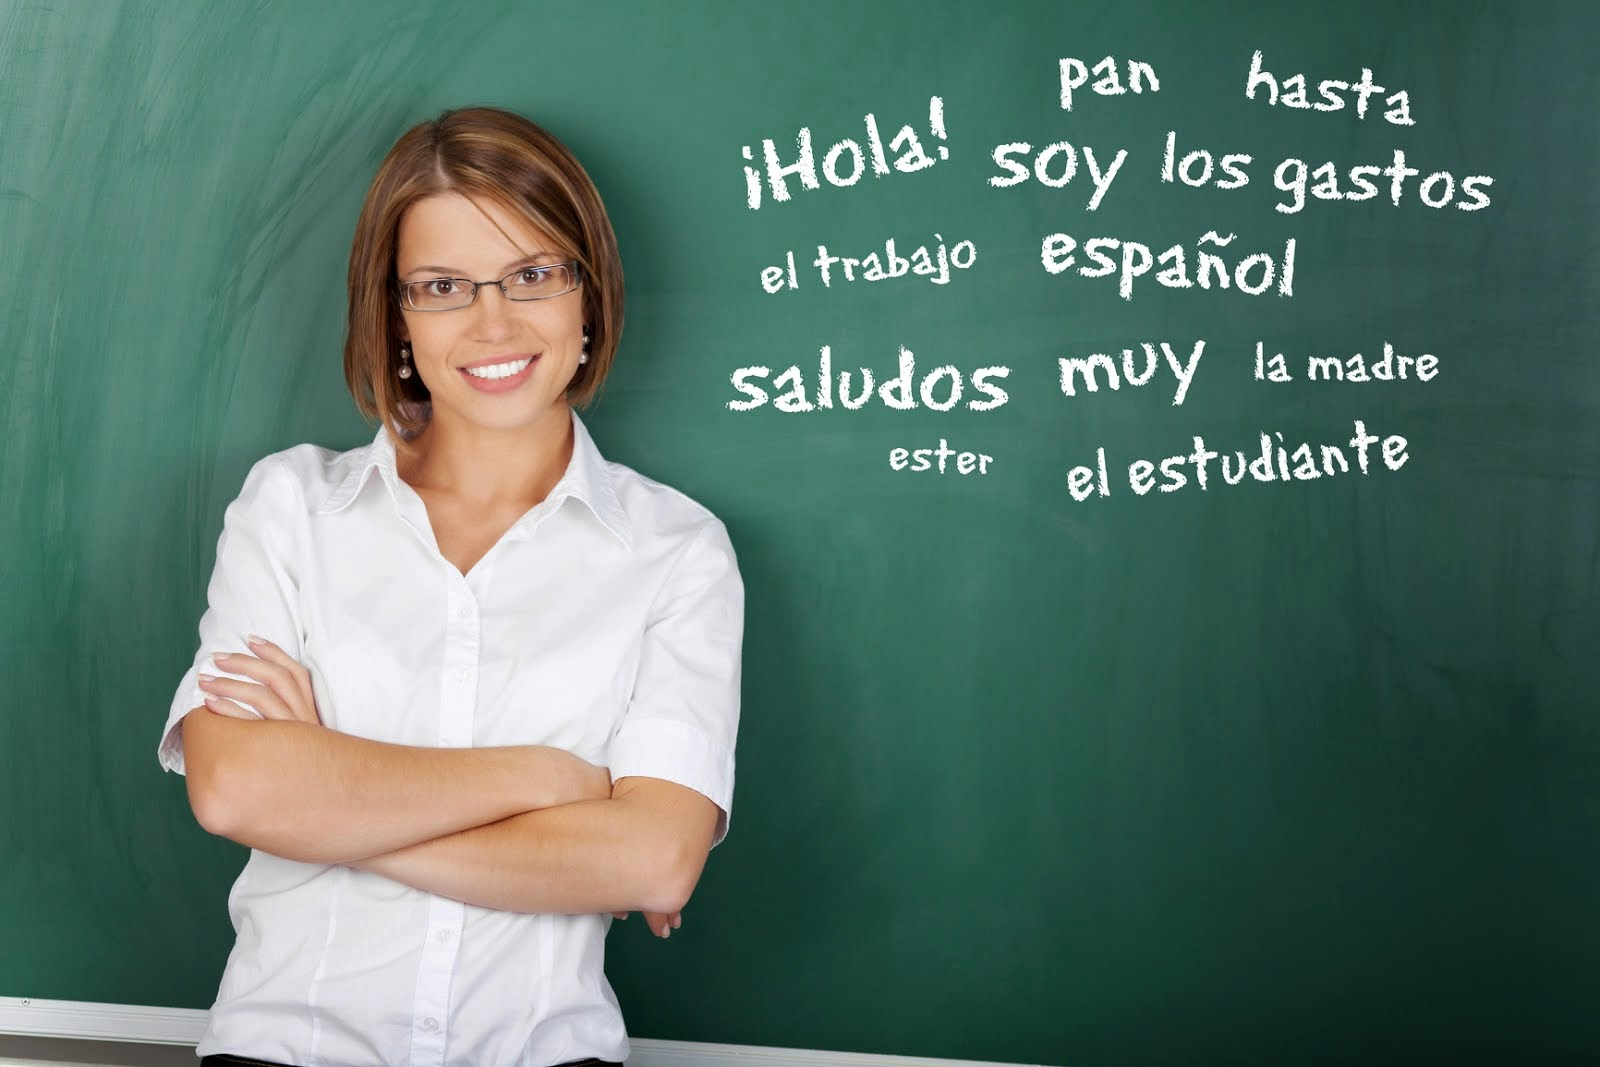 Profesores de español